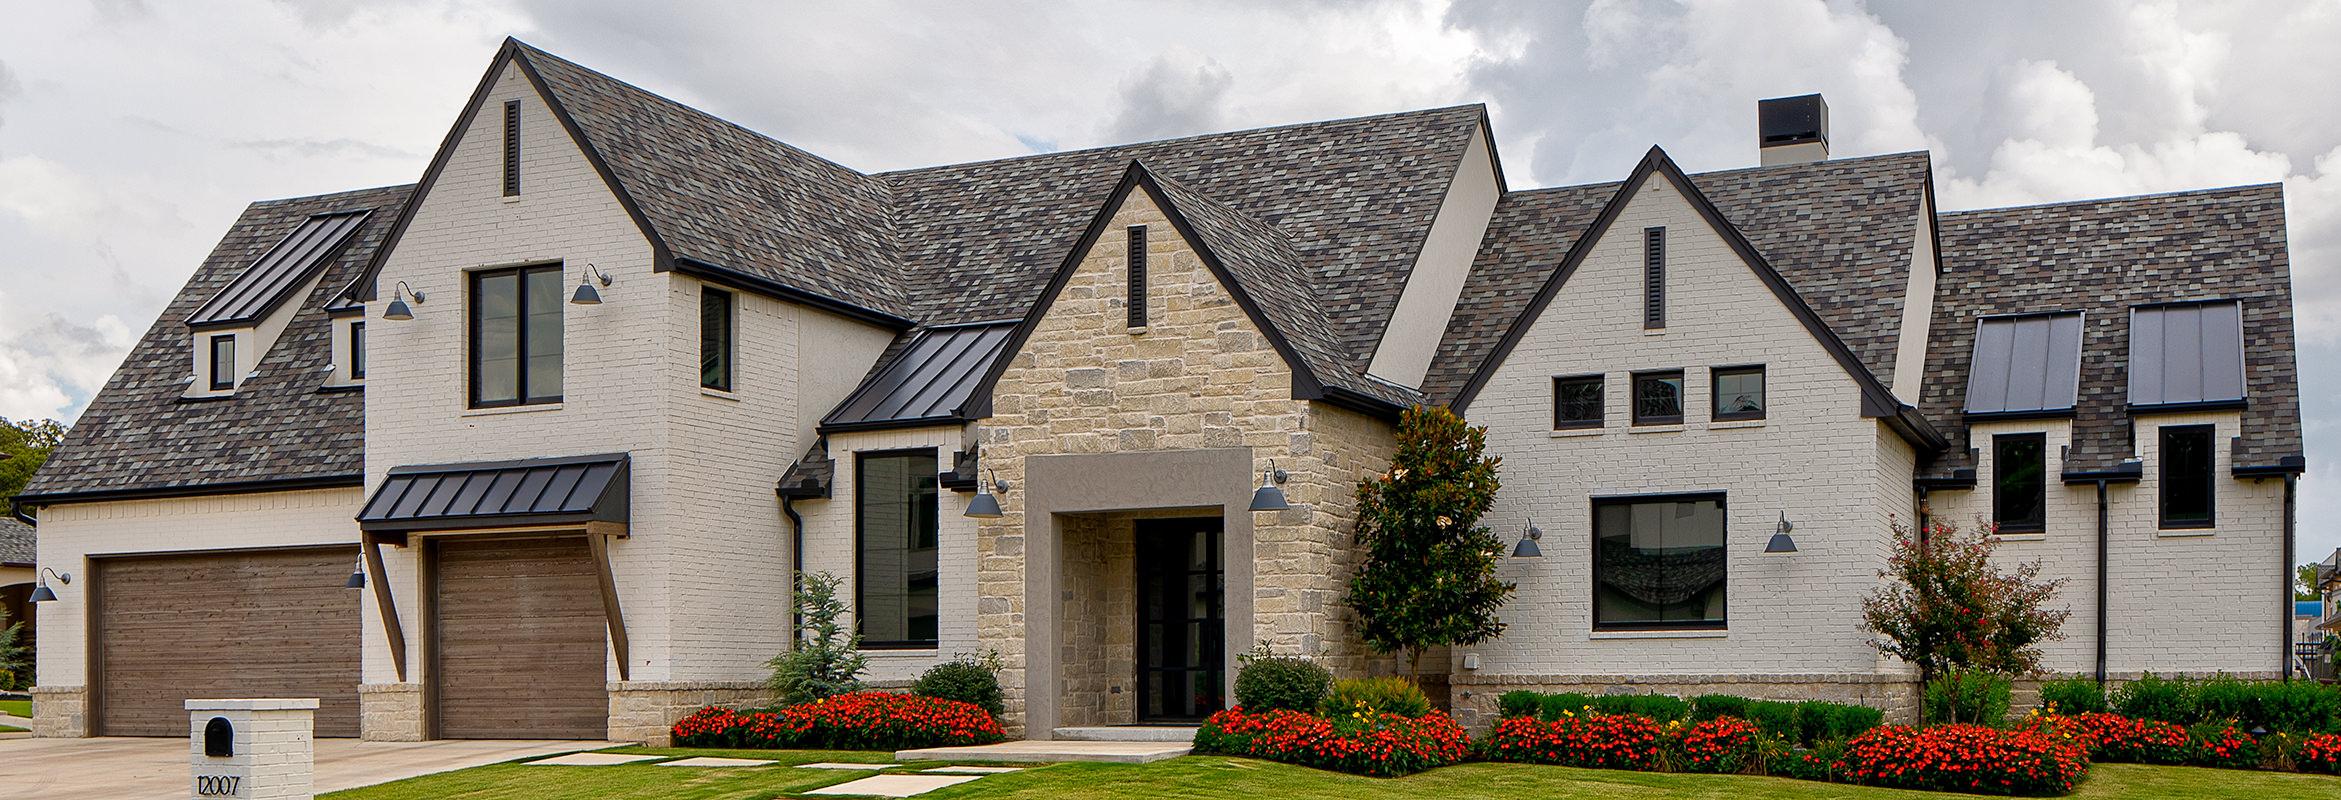 custom-home-designs-by-bainbridge-design-group